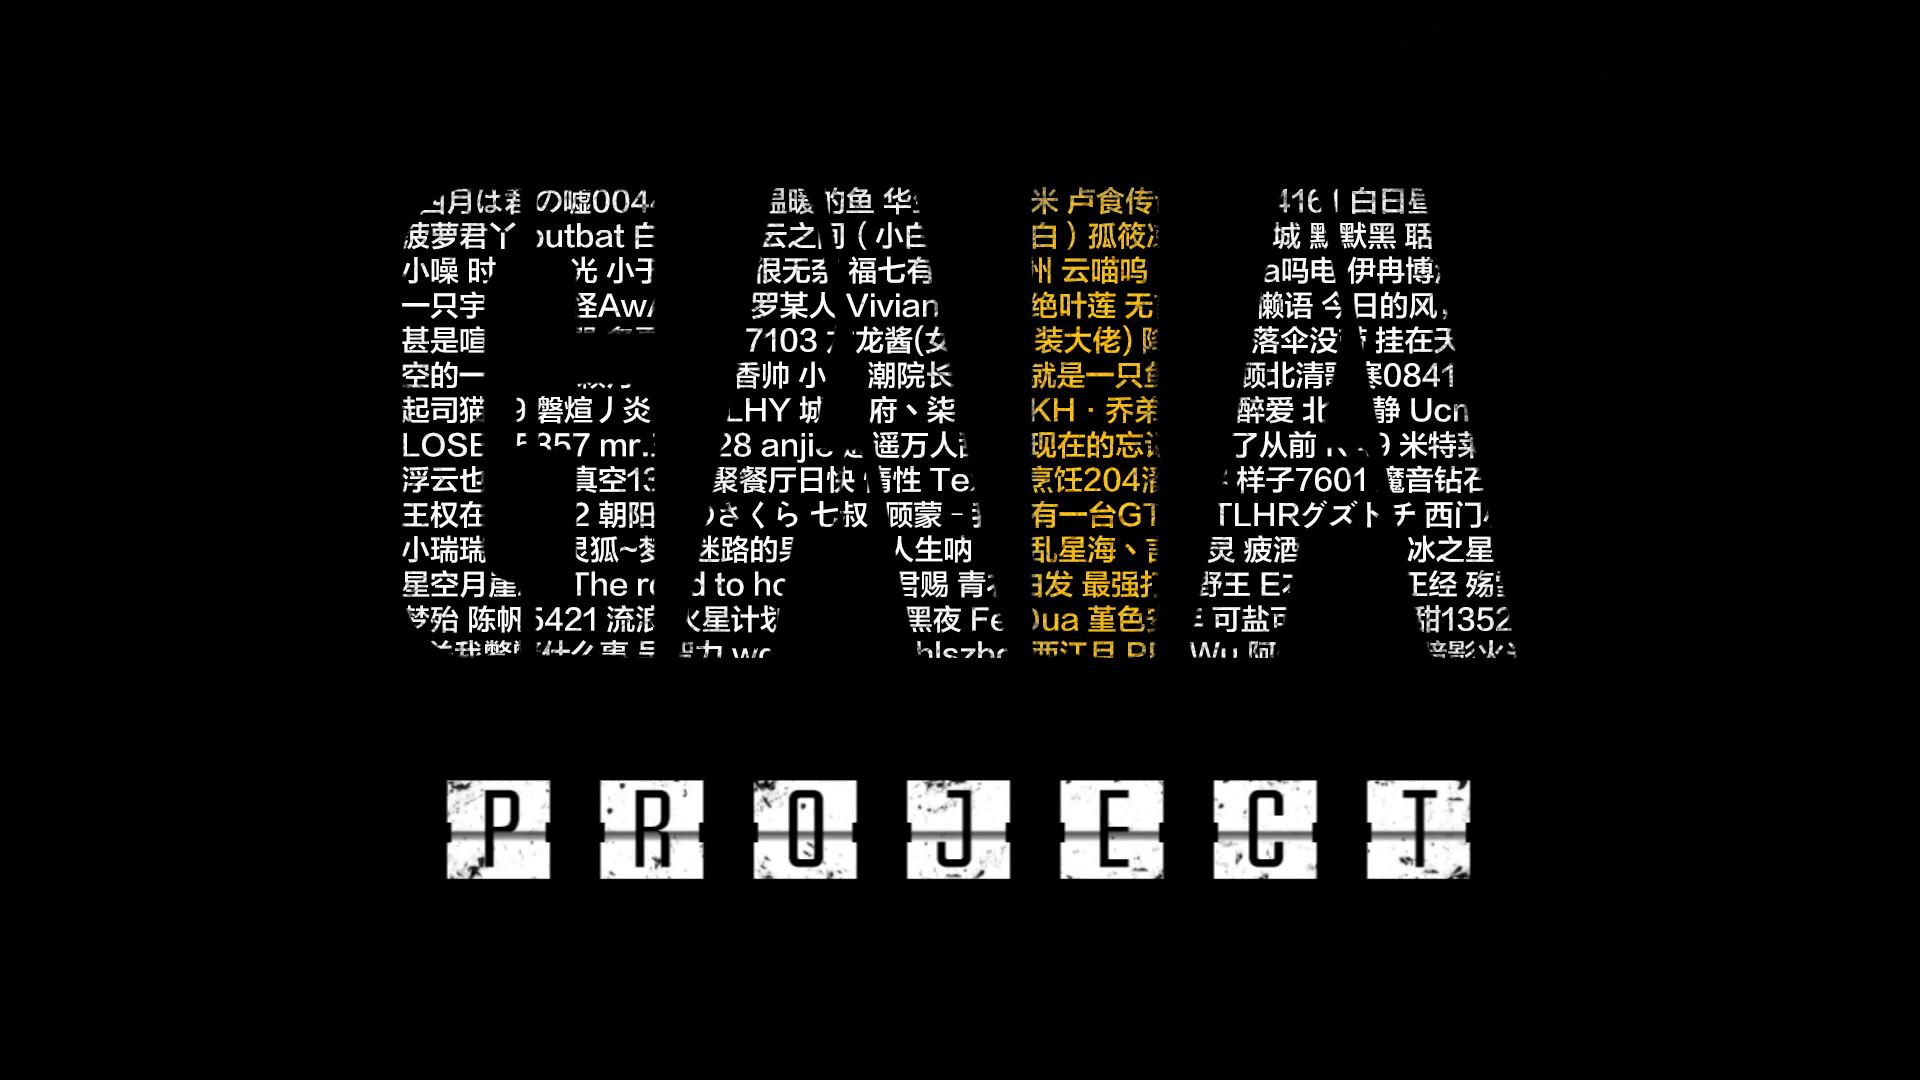 致《Project:GAIA》玩家的感谢信